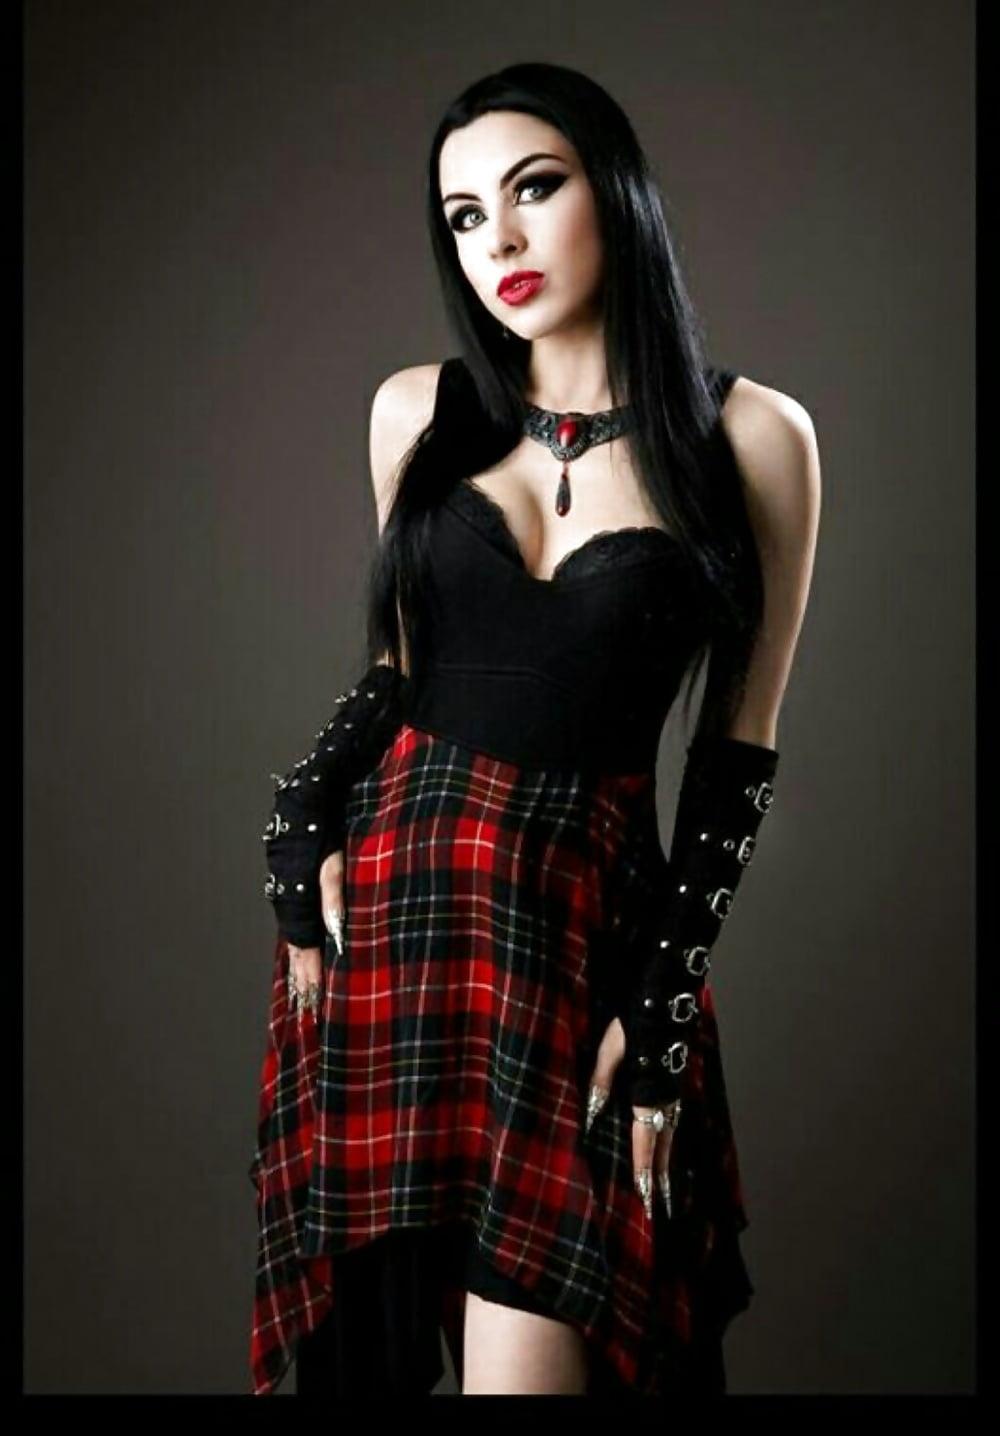 Goth lifestyle sex